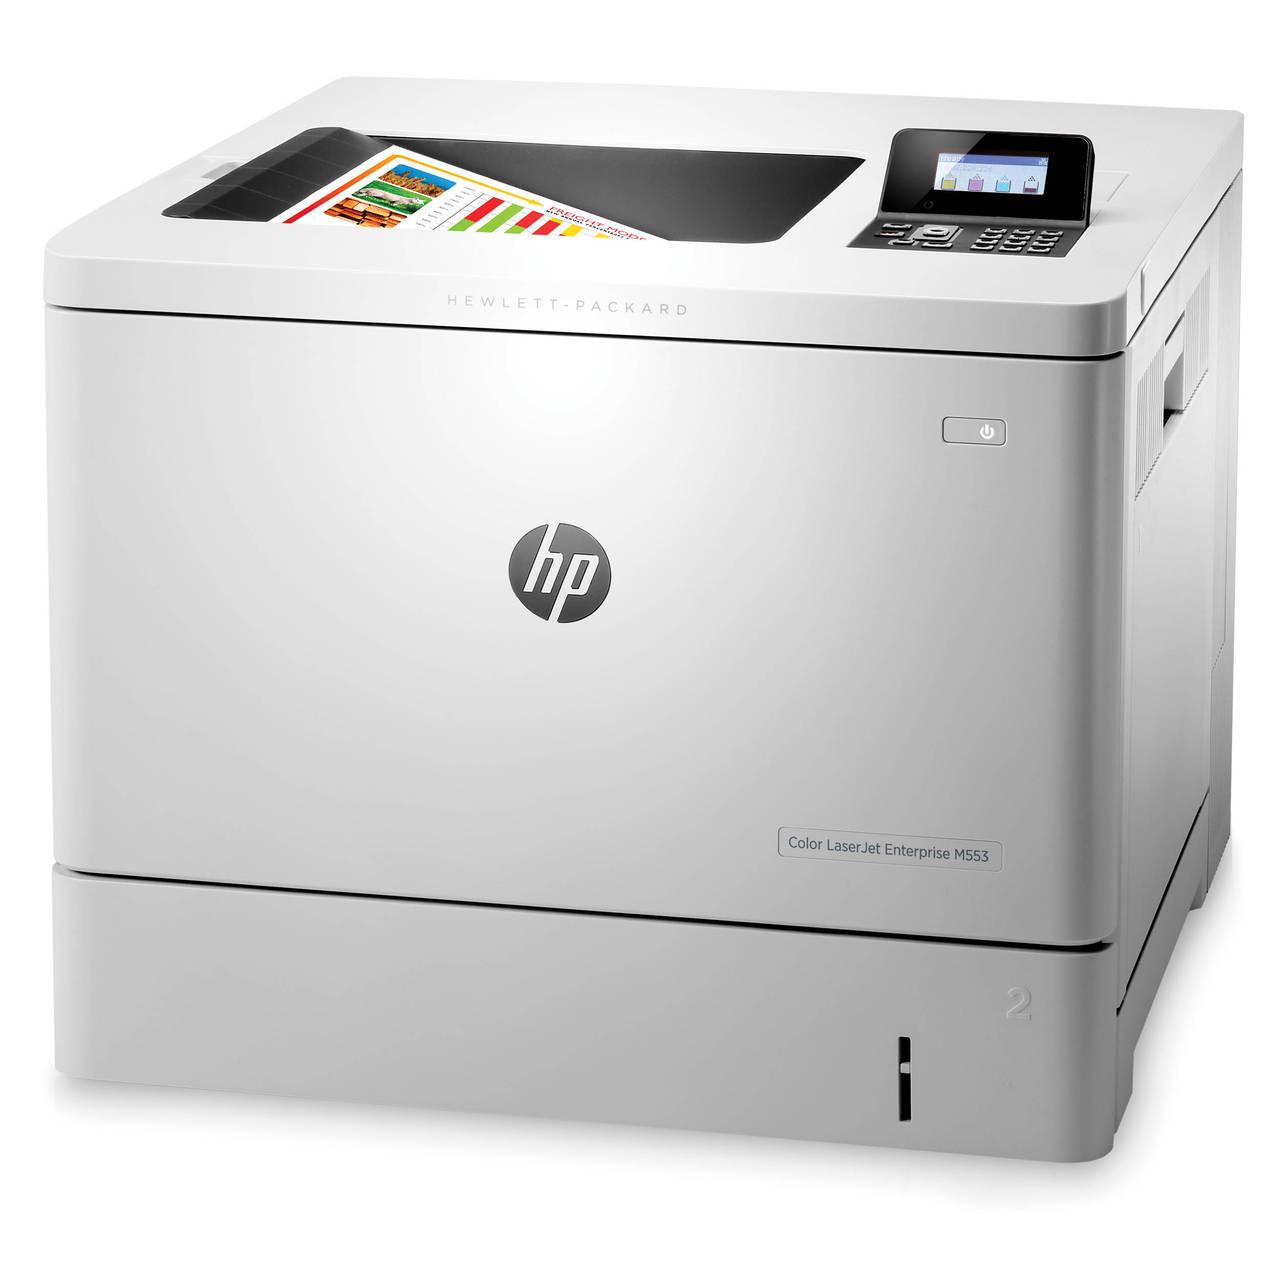 HP Color LaserJet M553DN - B5L25A#AAZ - HP Laser Printer for sale